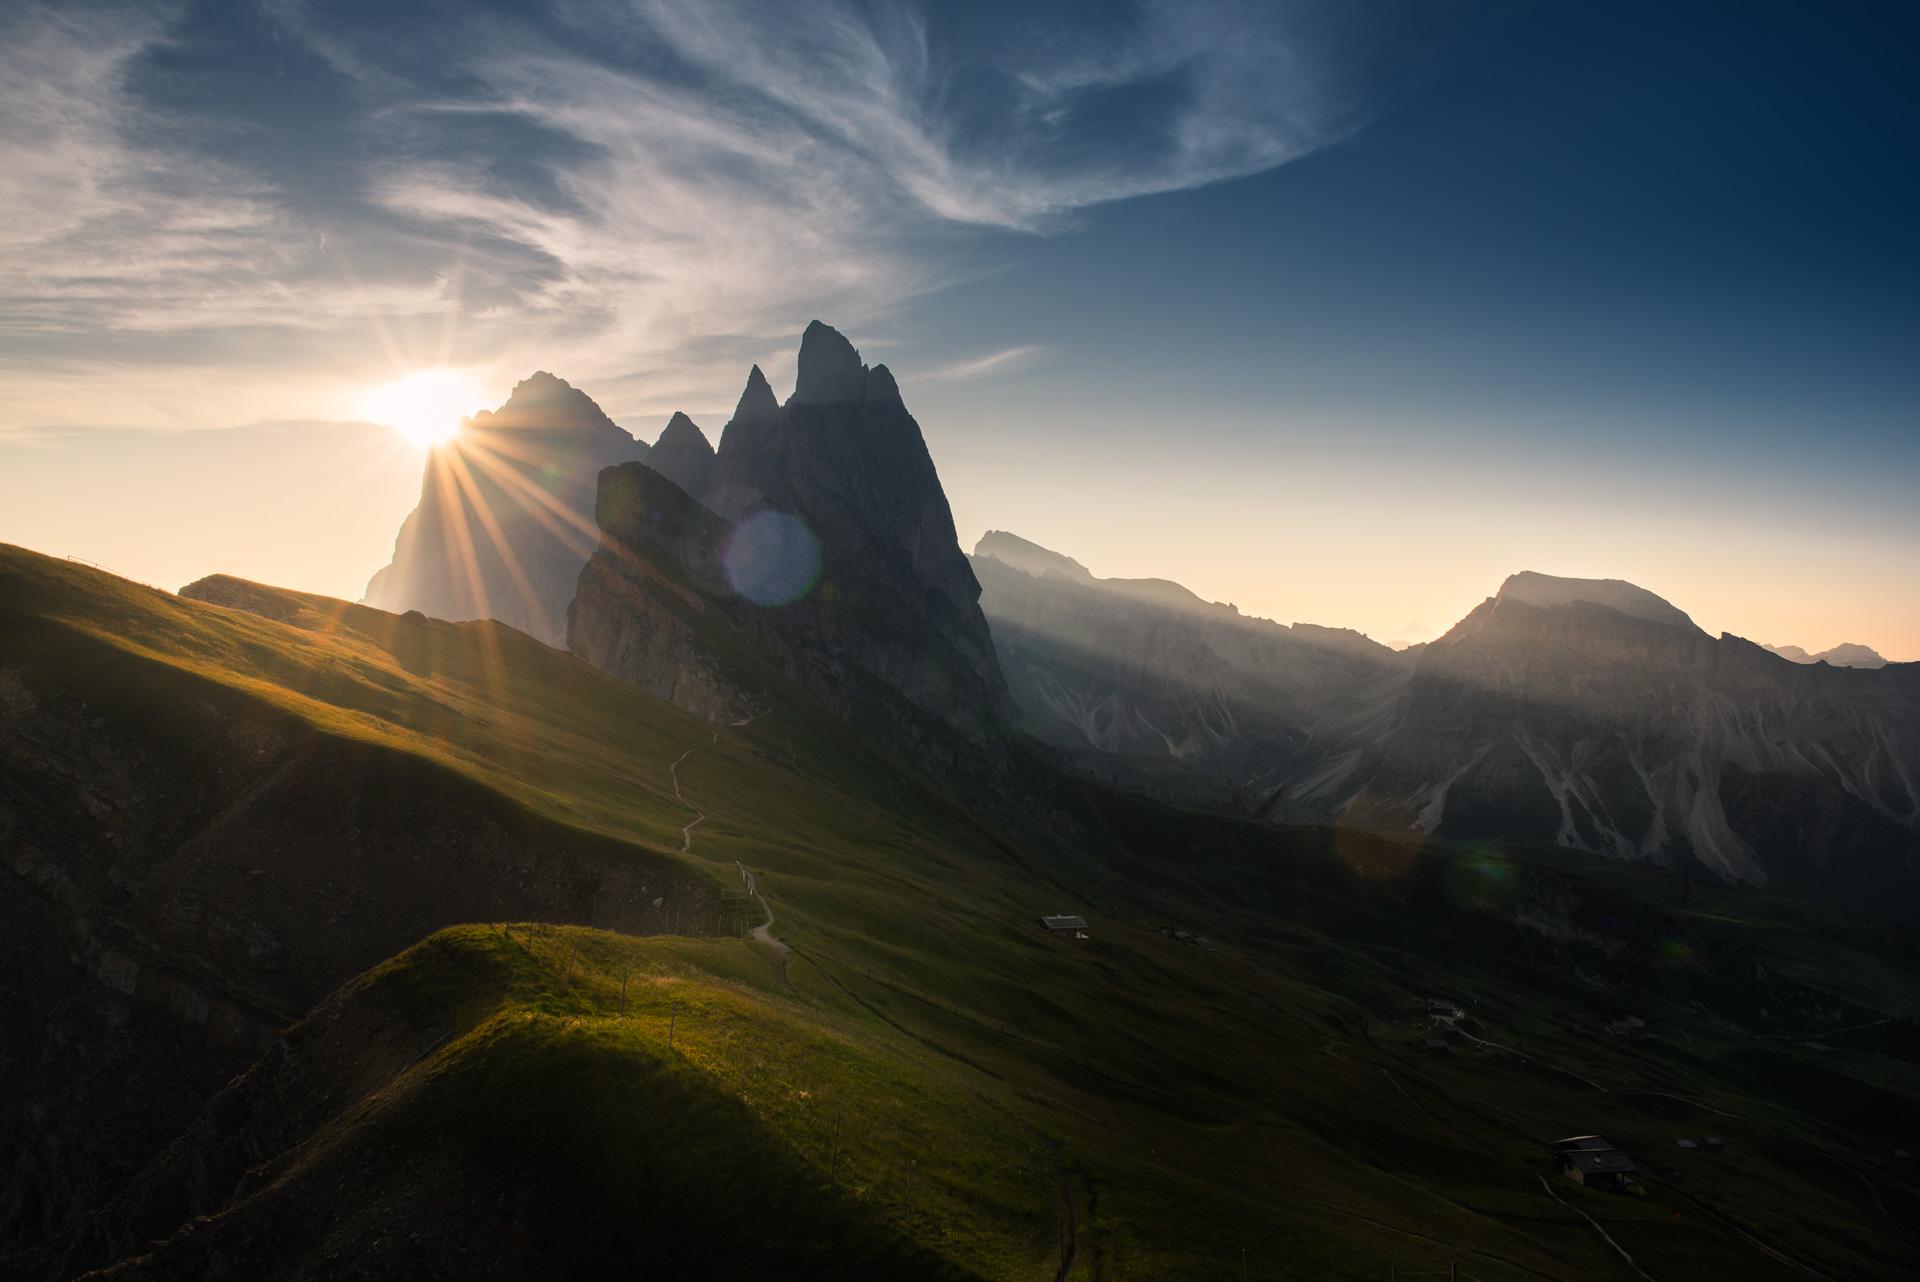 Dolomites, Italy 2015